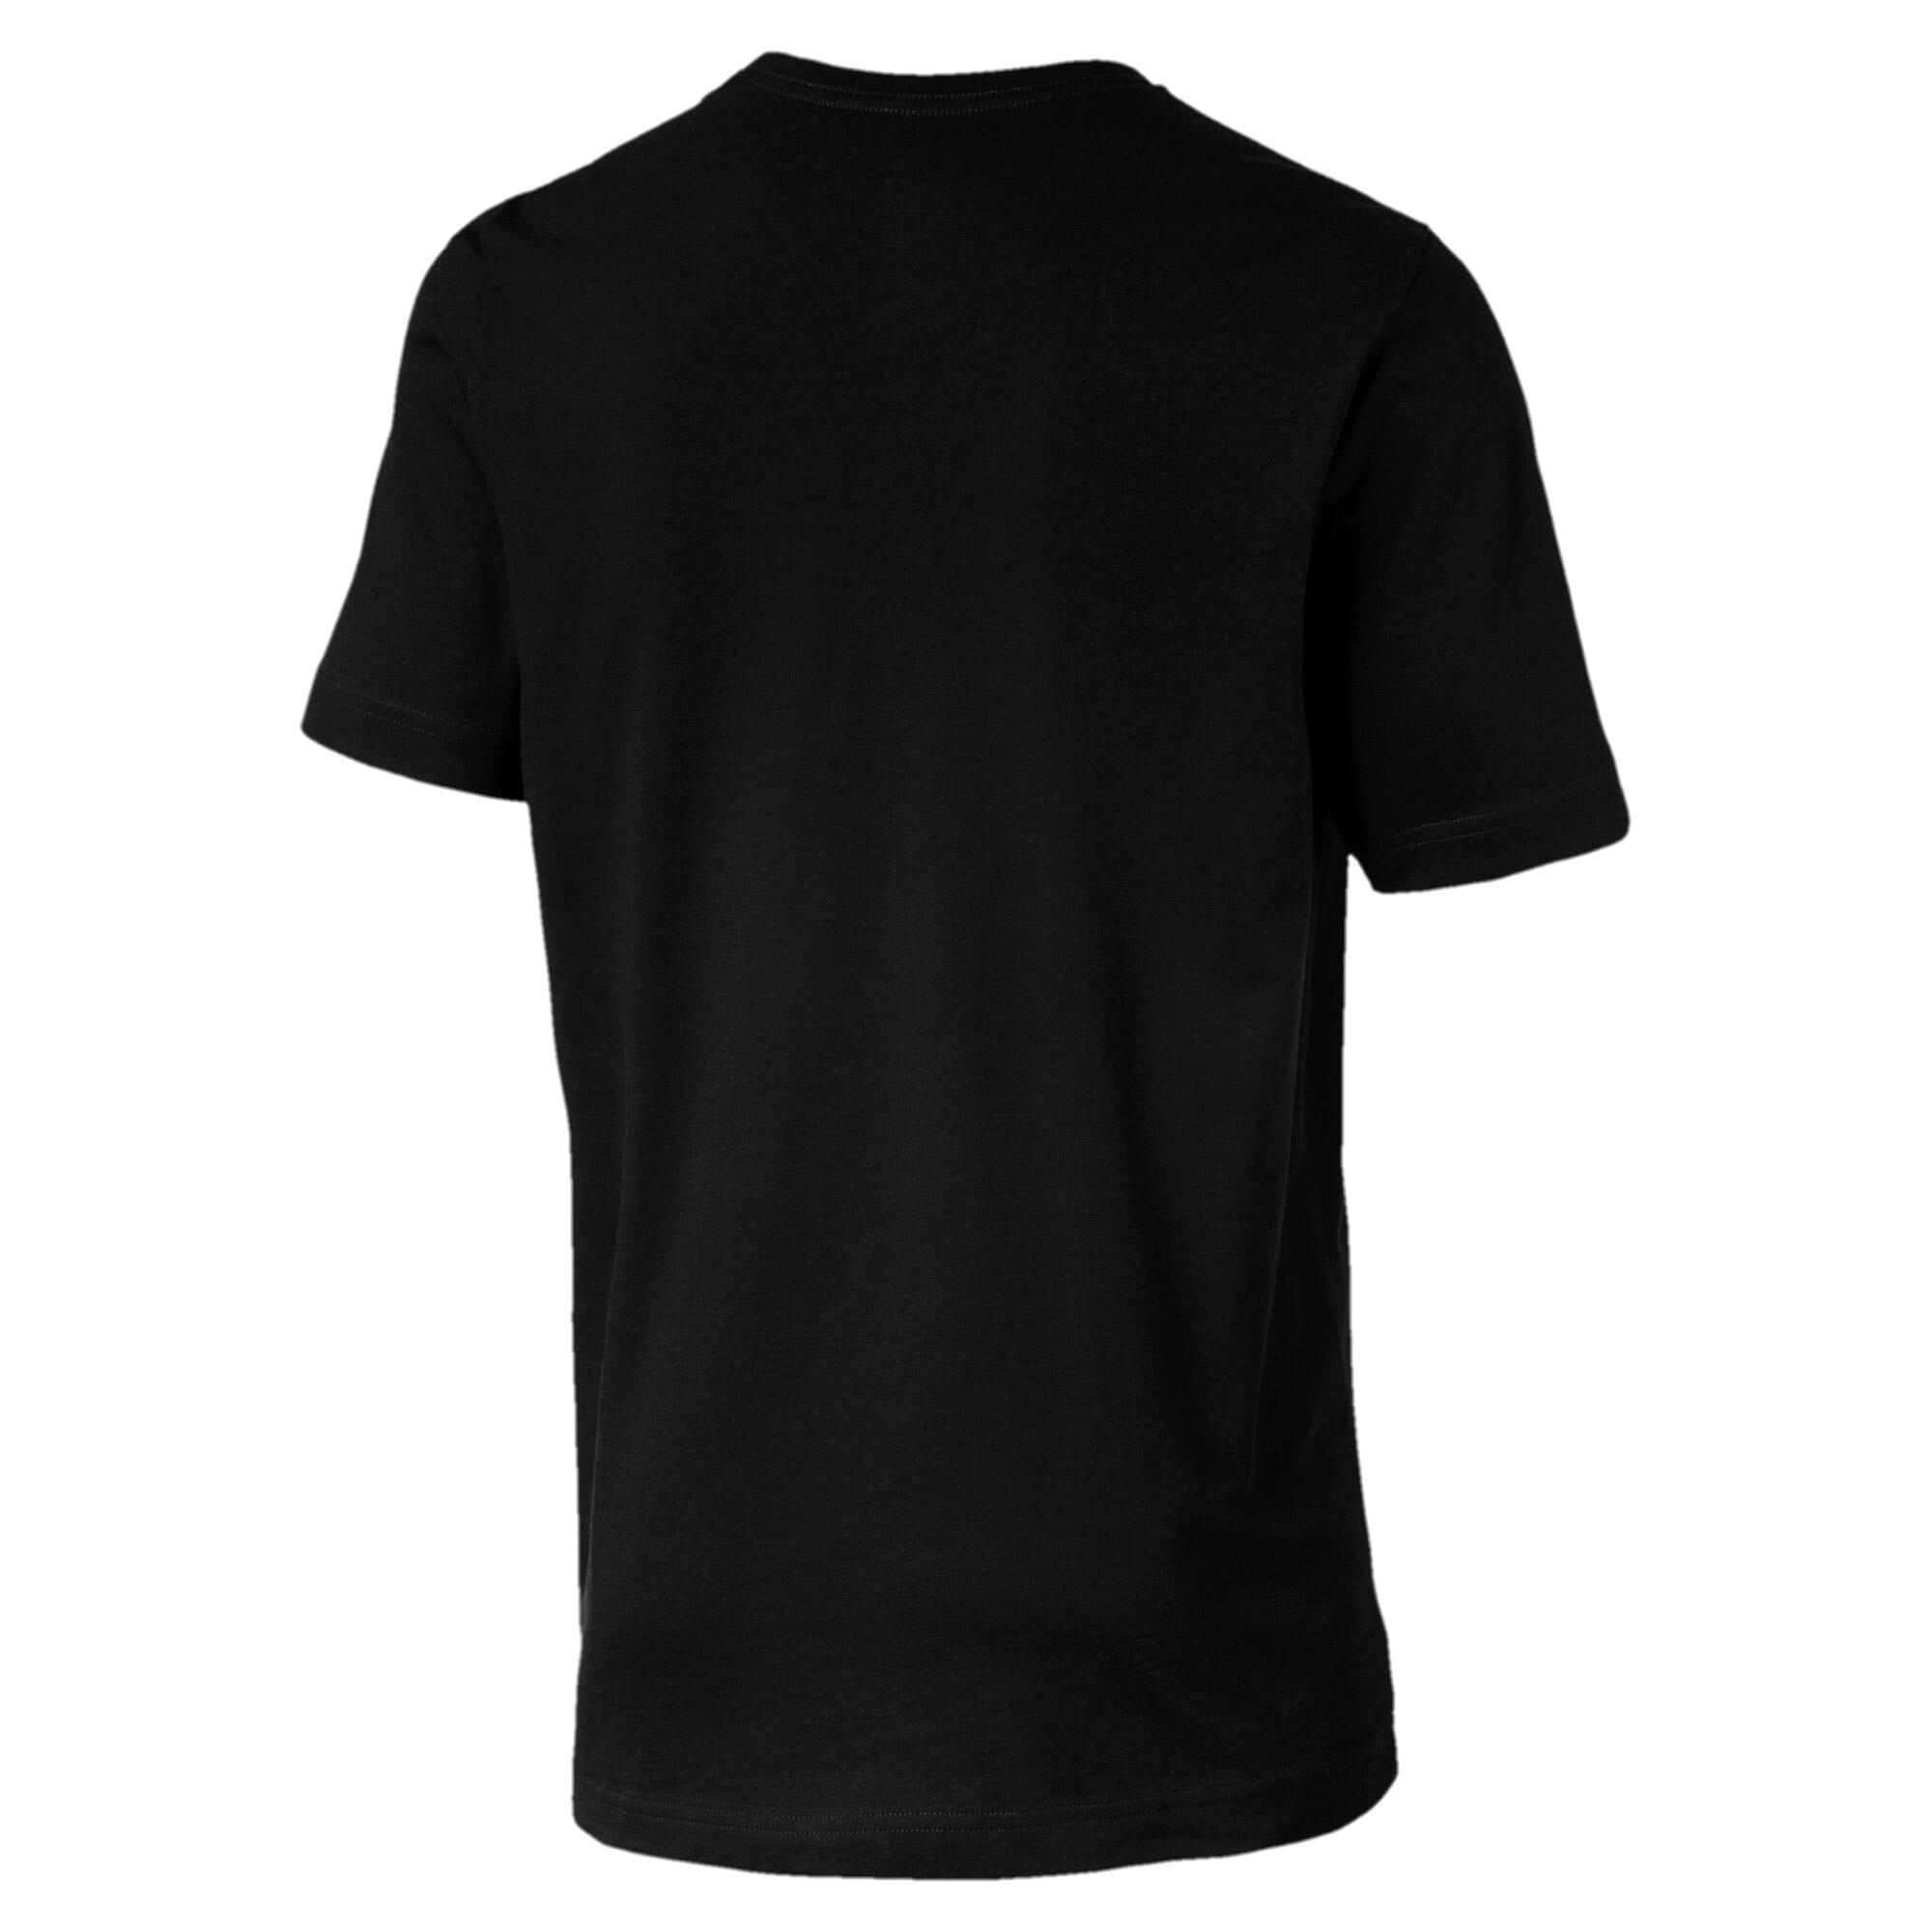 Thumbnail 2 of T-shirt a maniche corte Essentials uomo, Cotton Black, medium